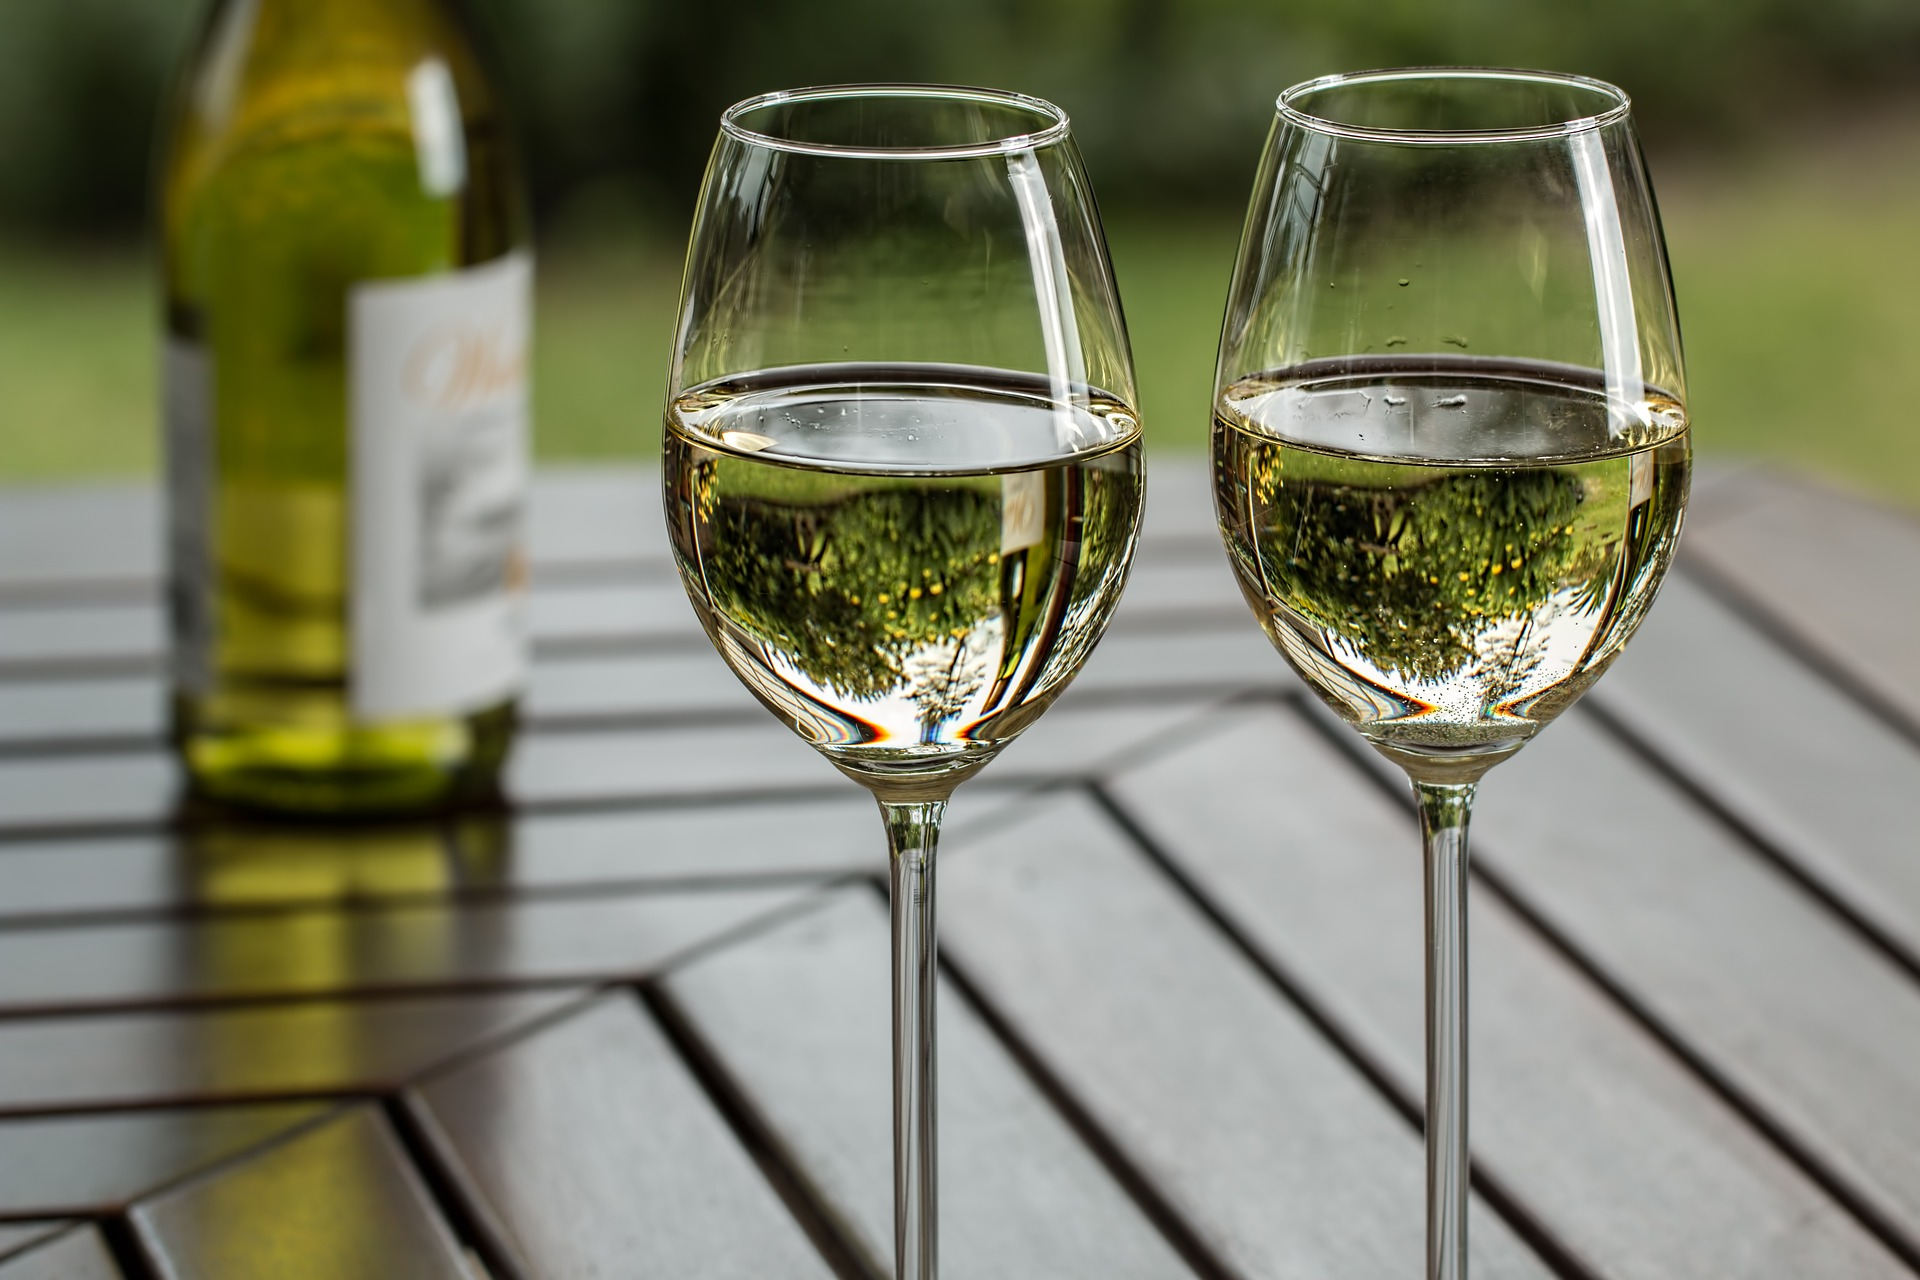 сама зеленое вино картинки предпочитают